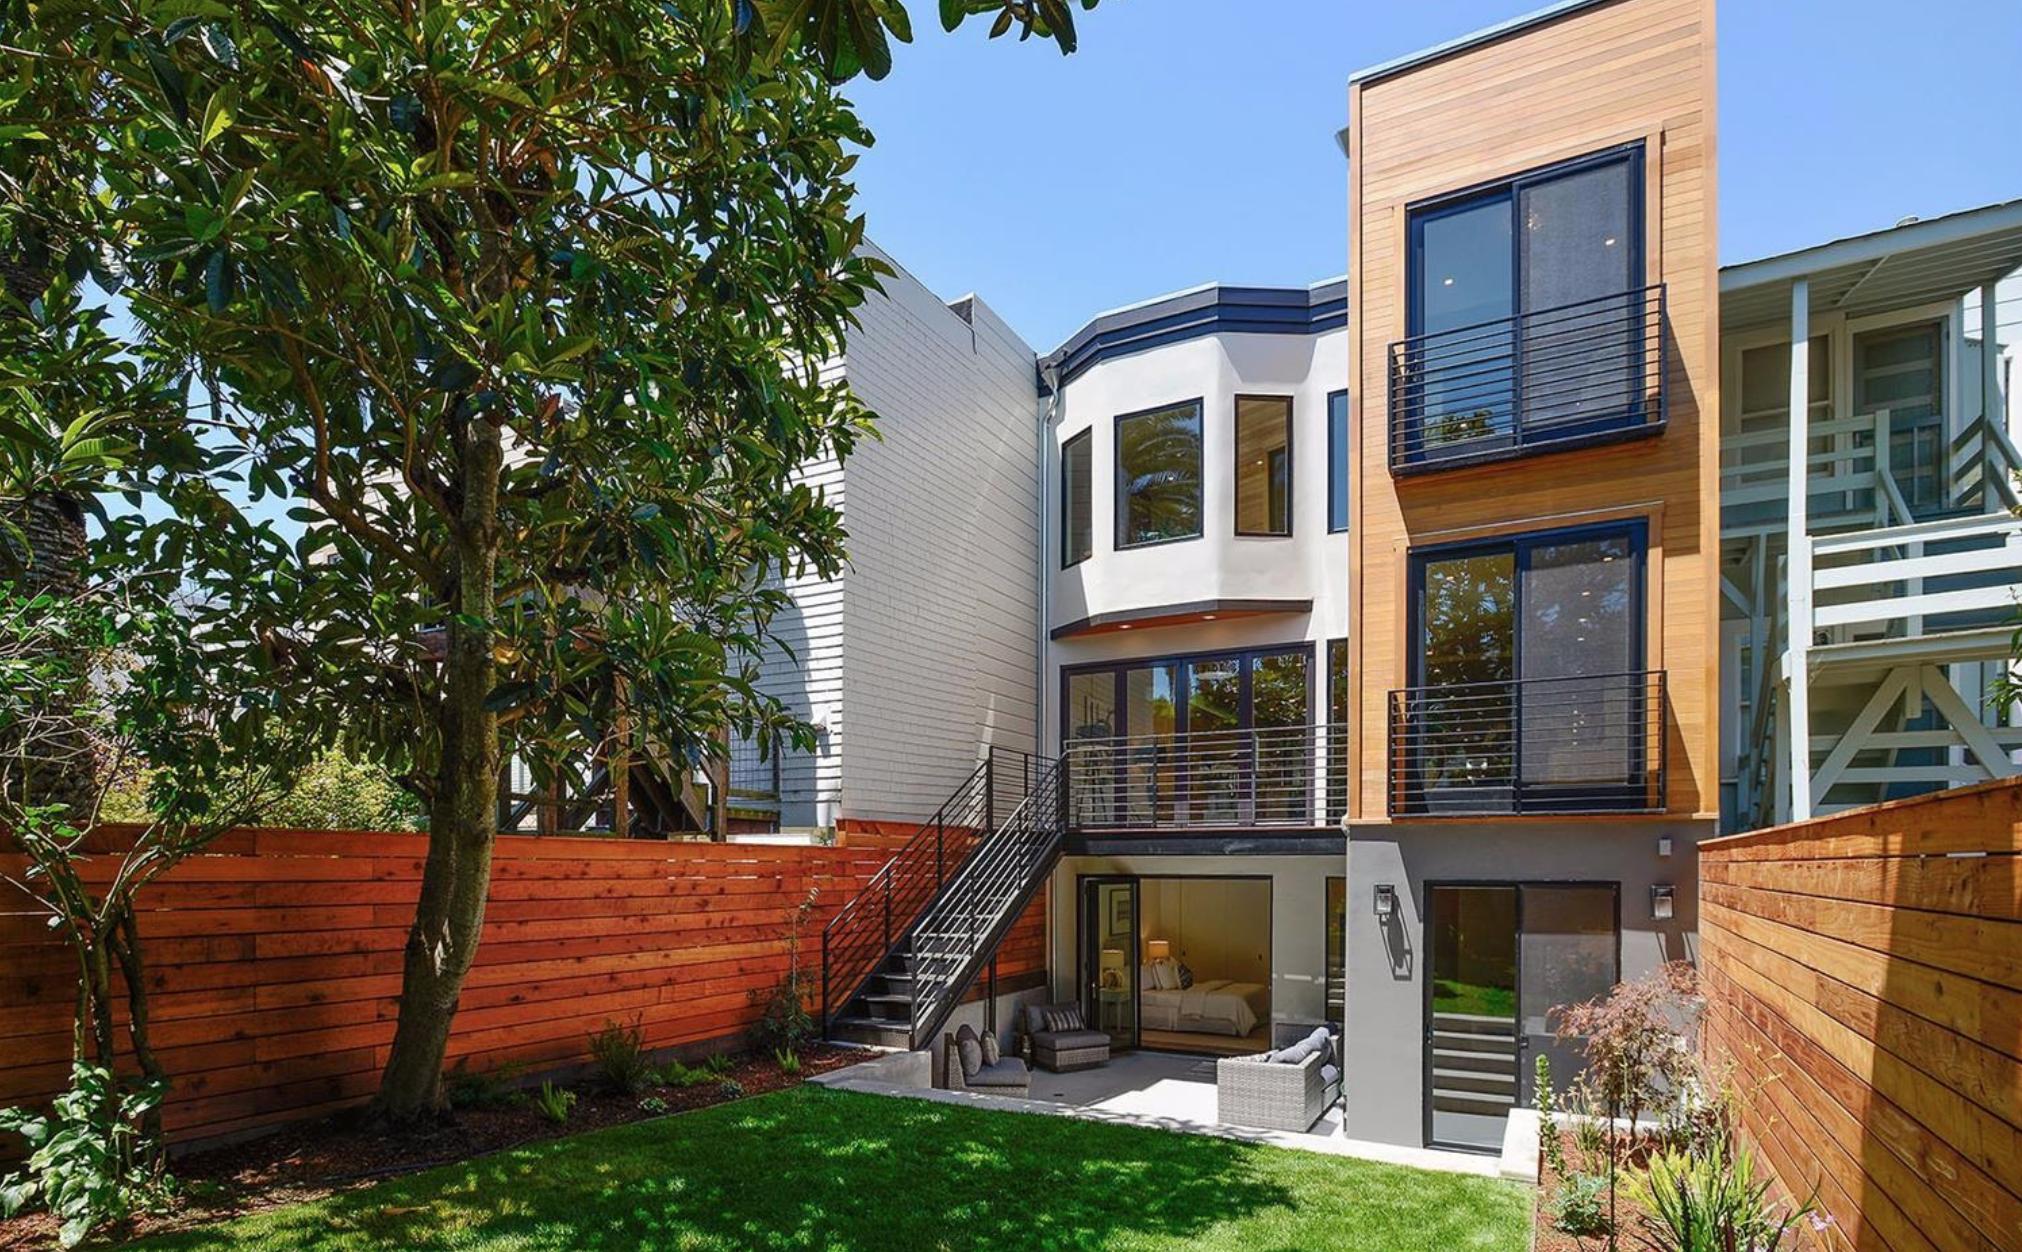 138-140 8th Avenue - Backyard